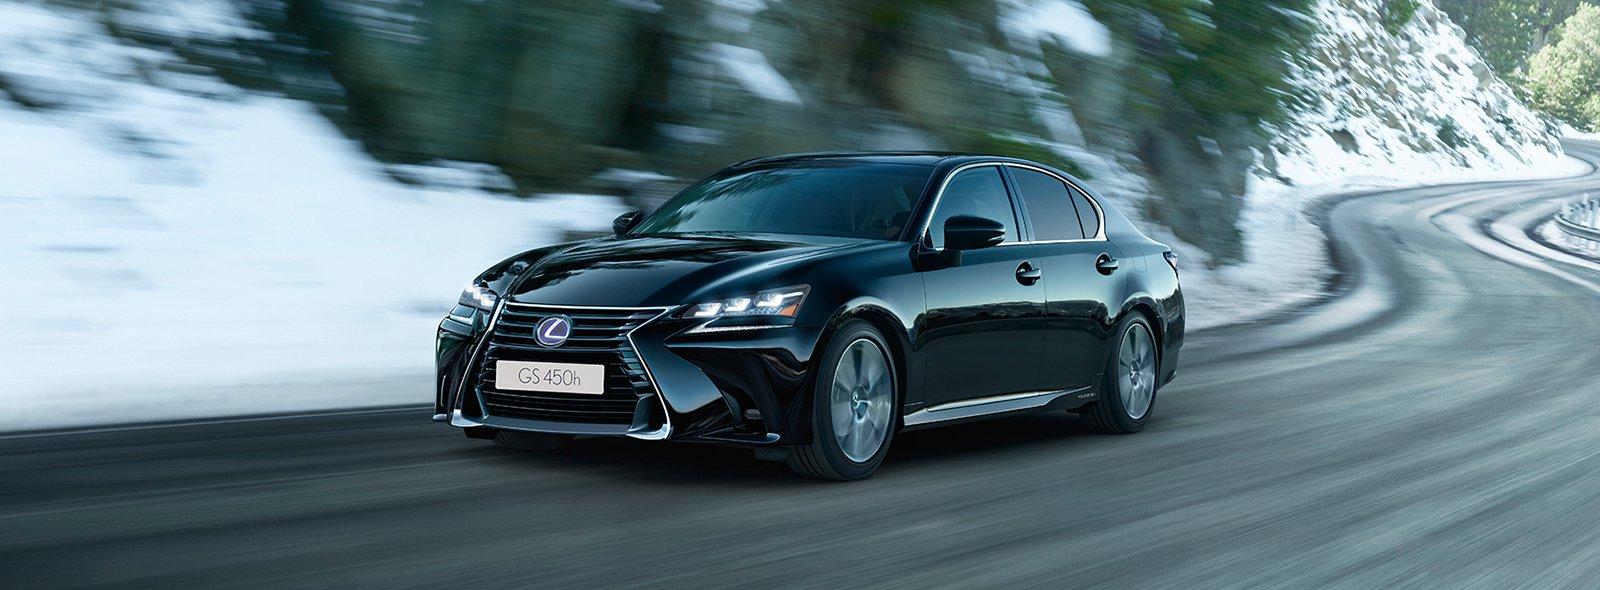 Svart Lexus GS 450h i vintermiljö